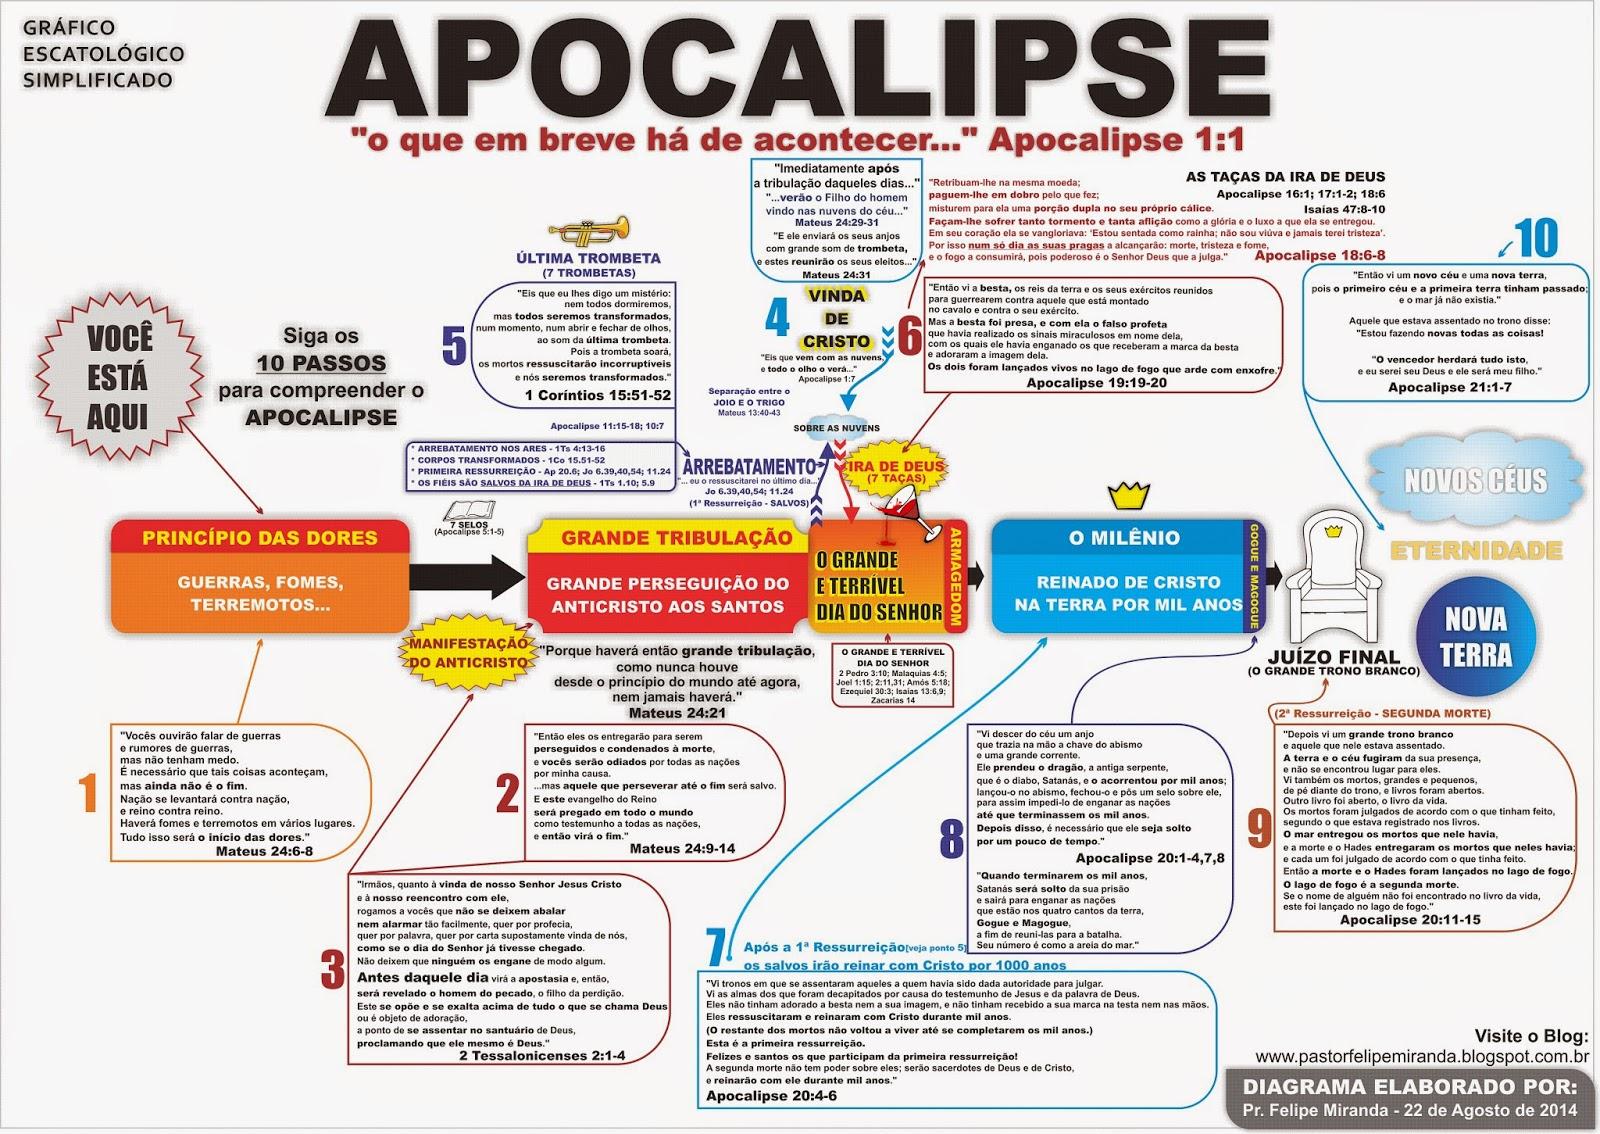 http://www.4shared.com/download/_hLkReaace/Apocalipse_em_ordem_cronolgica.bmp?lgfp=3000